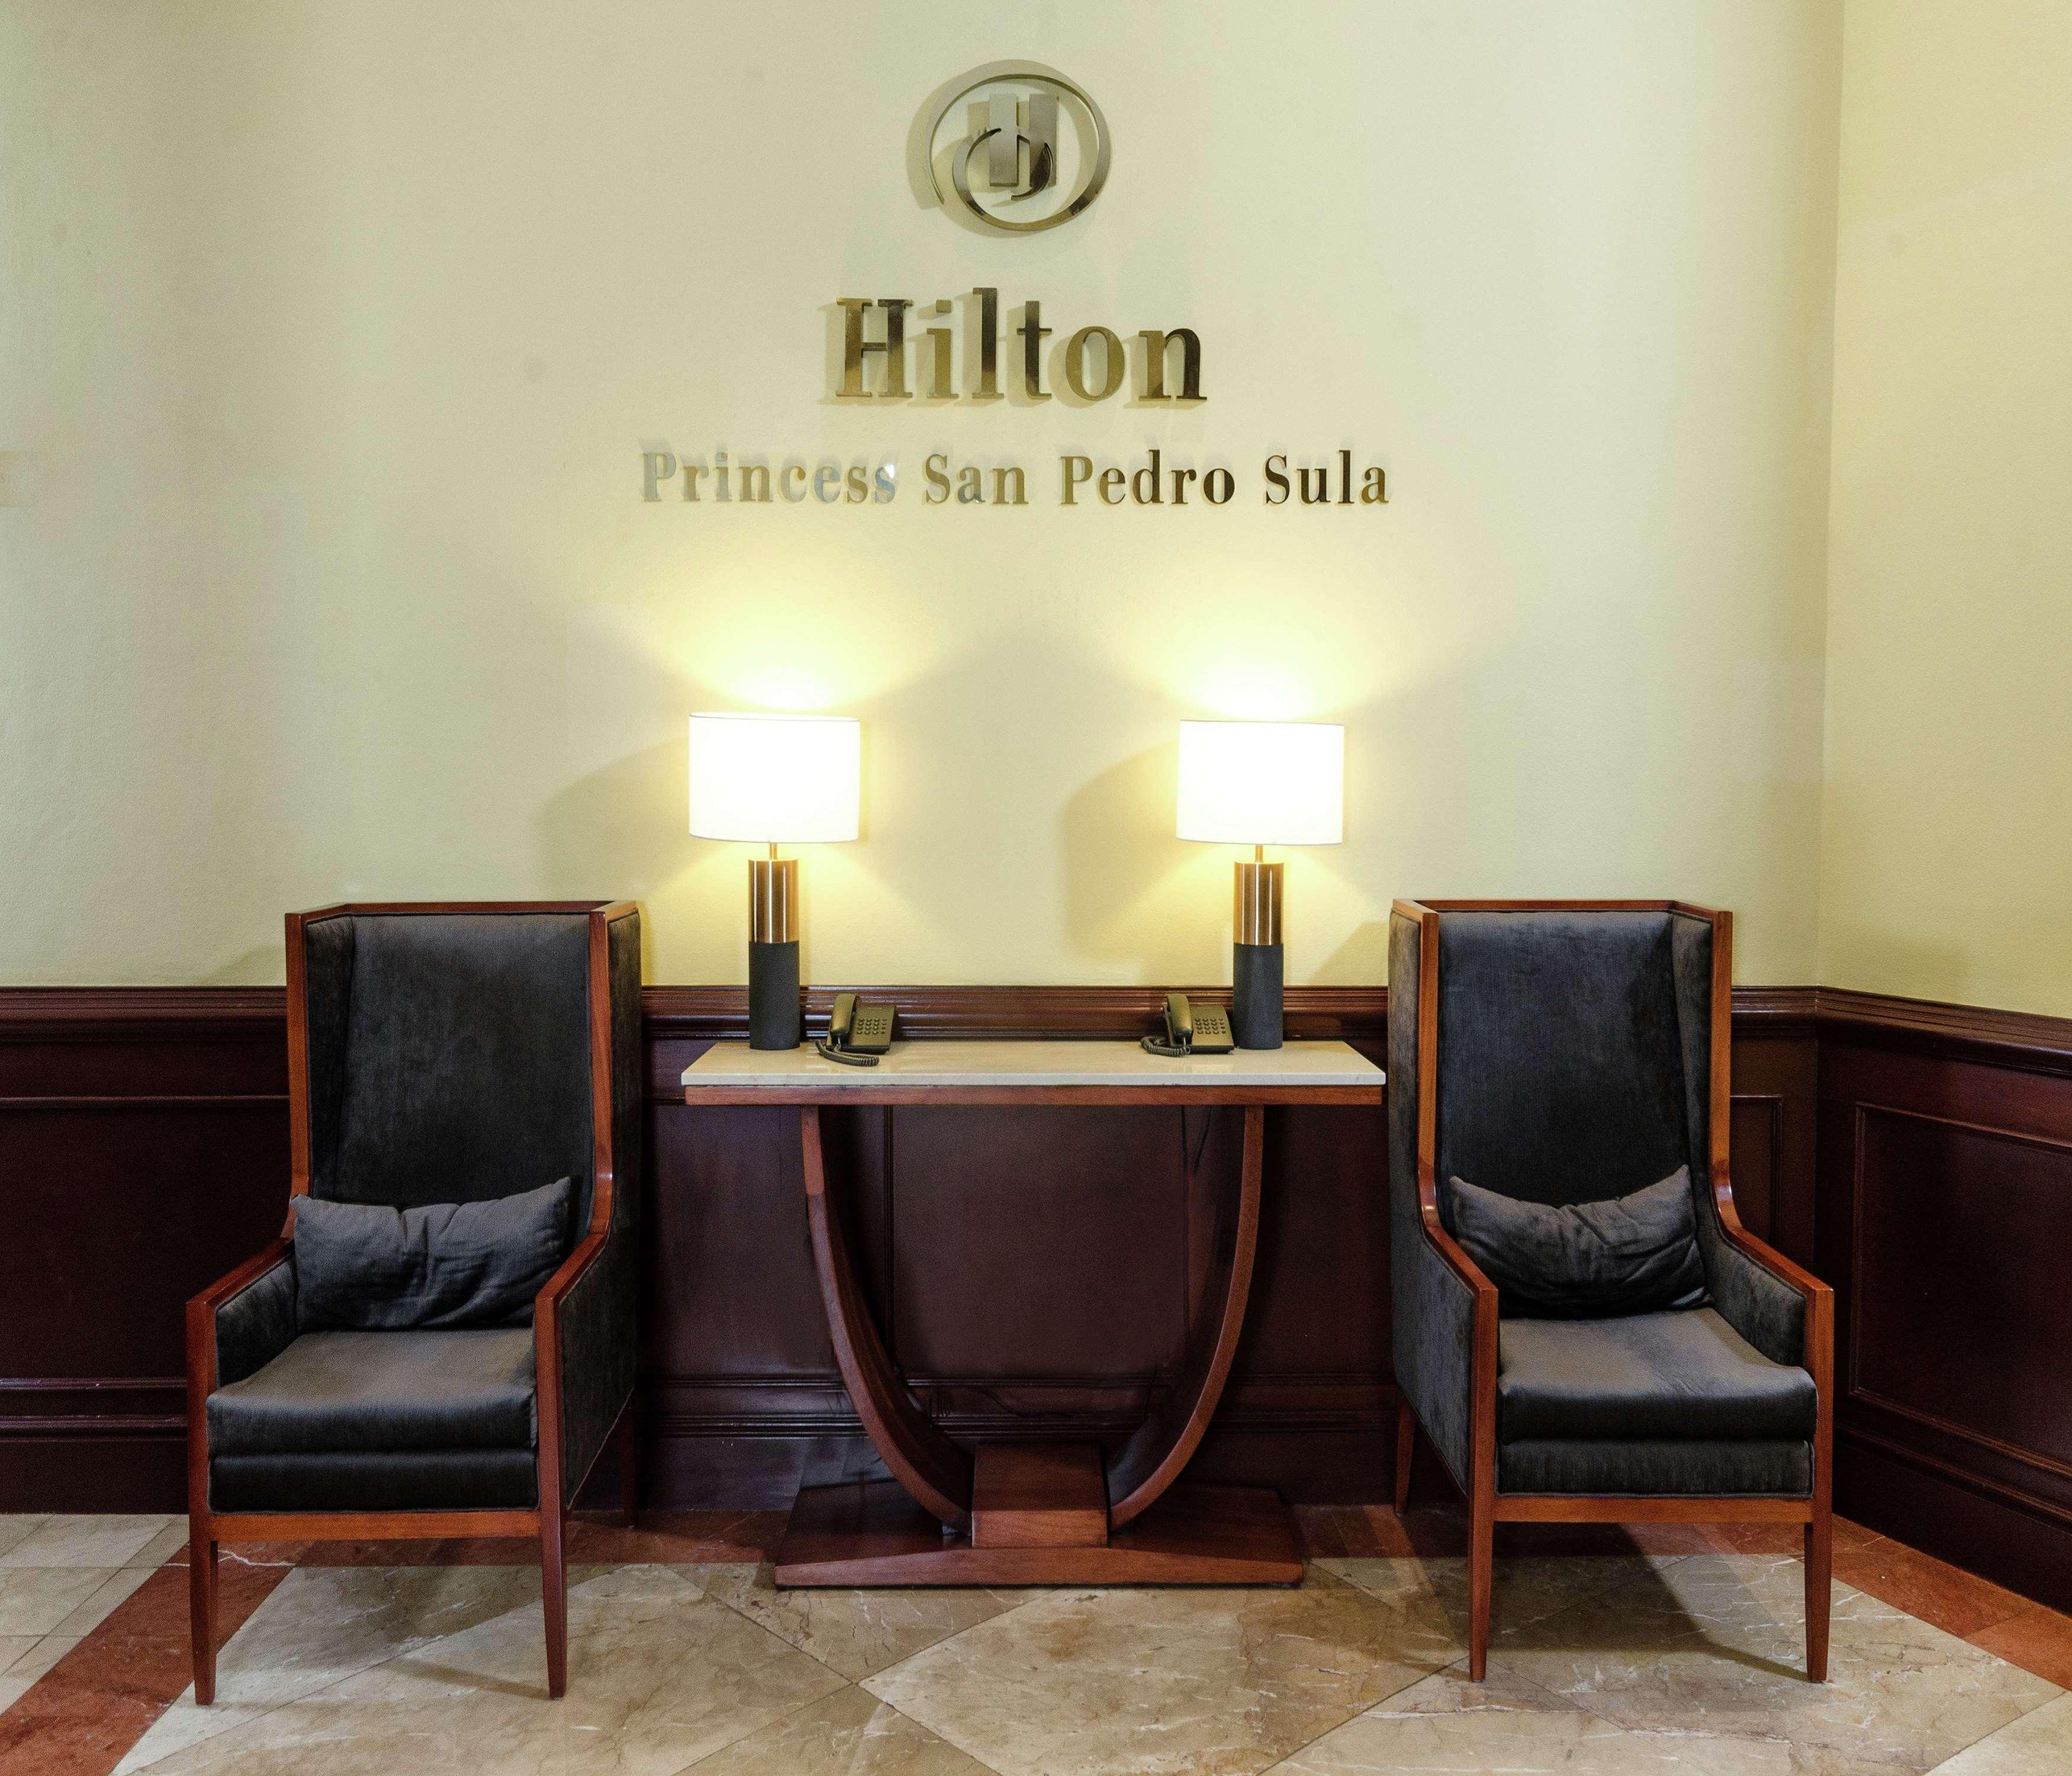 Hilton Princess San Pedro Sula